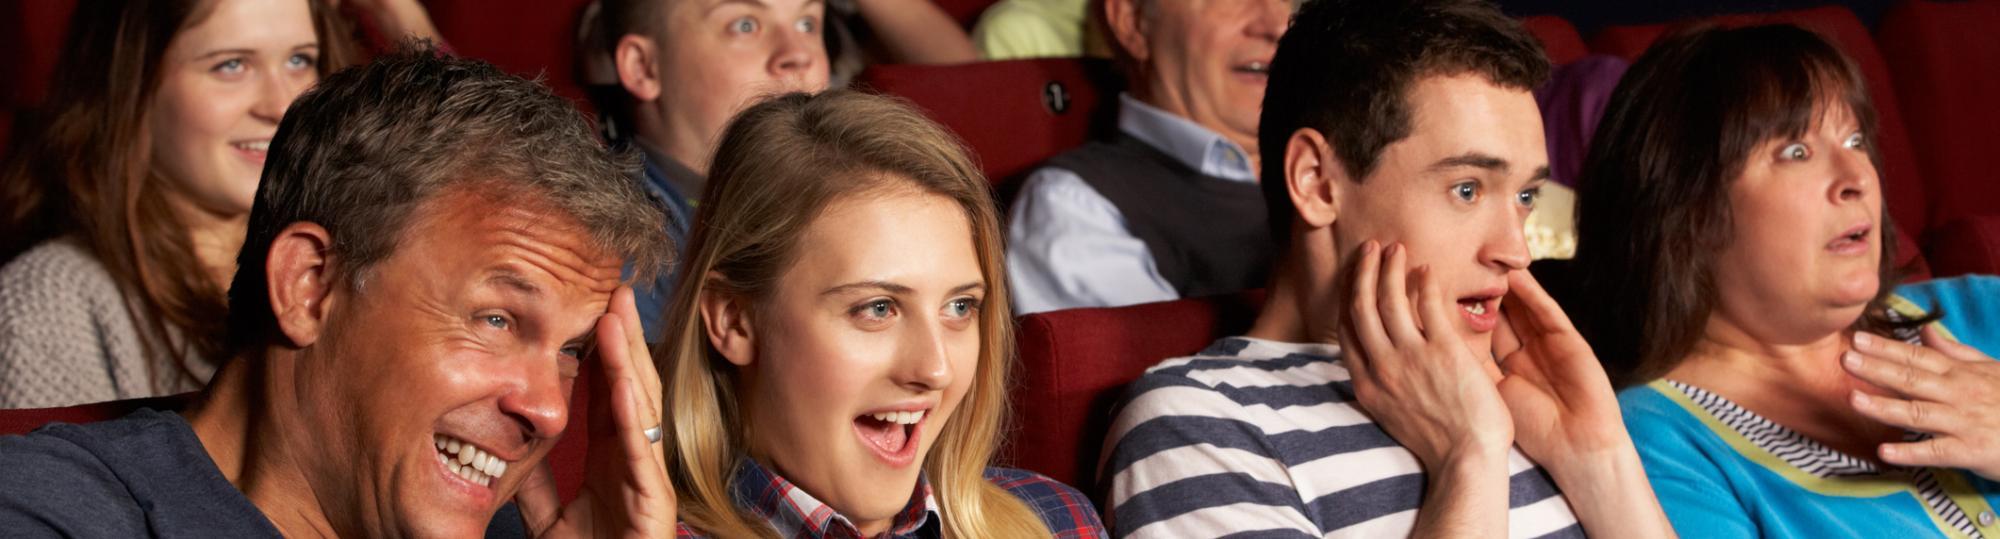 Malco Theatre Military Discount with Veterans Advantage